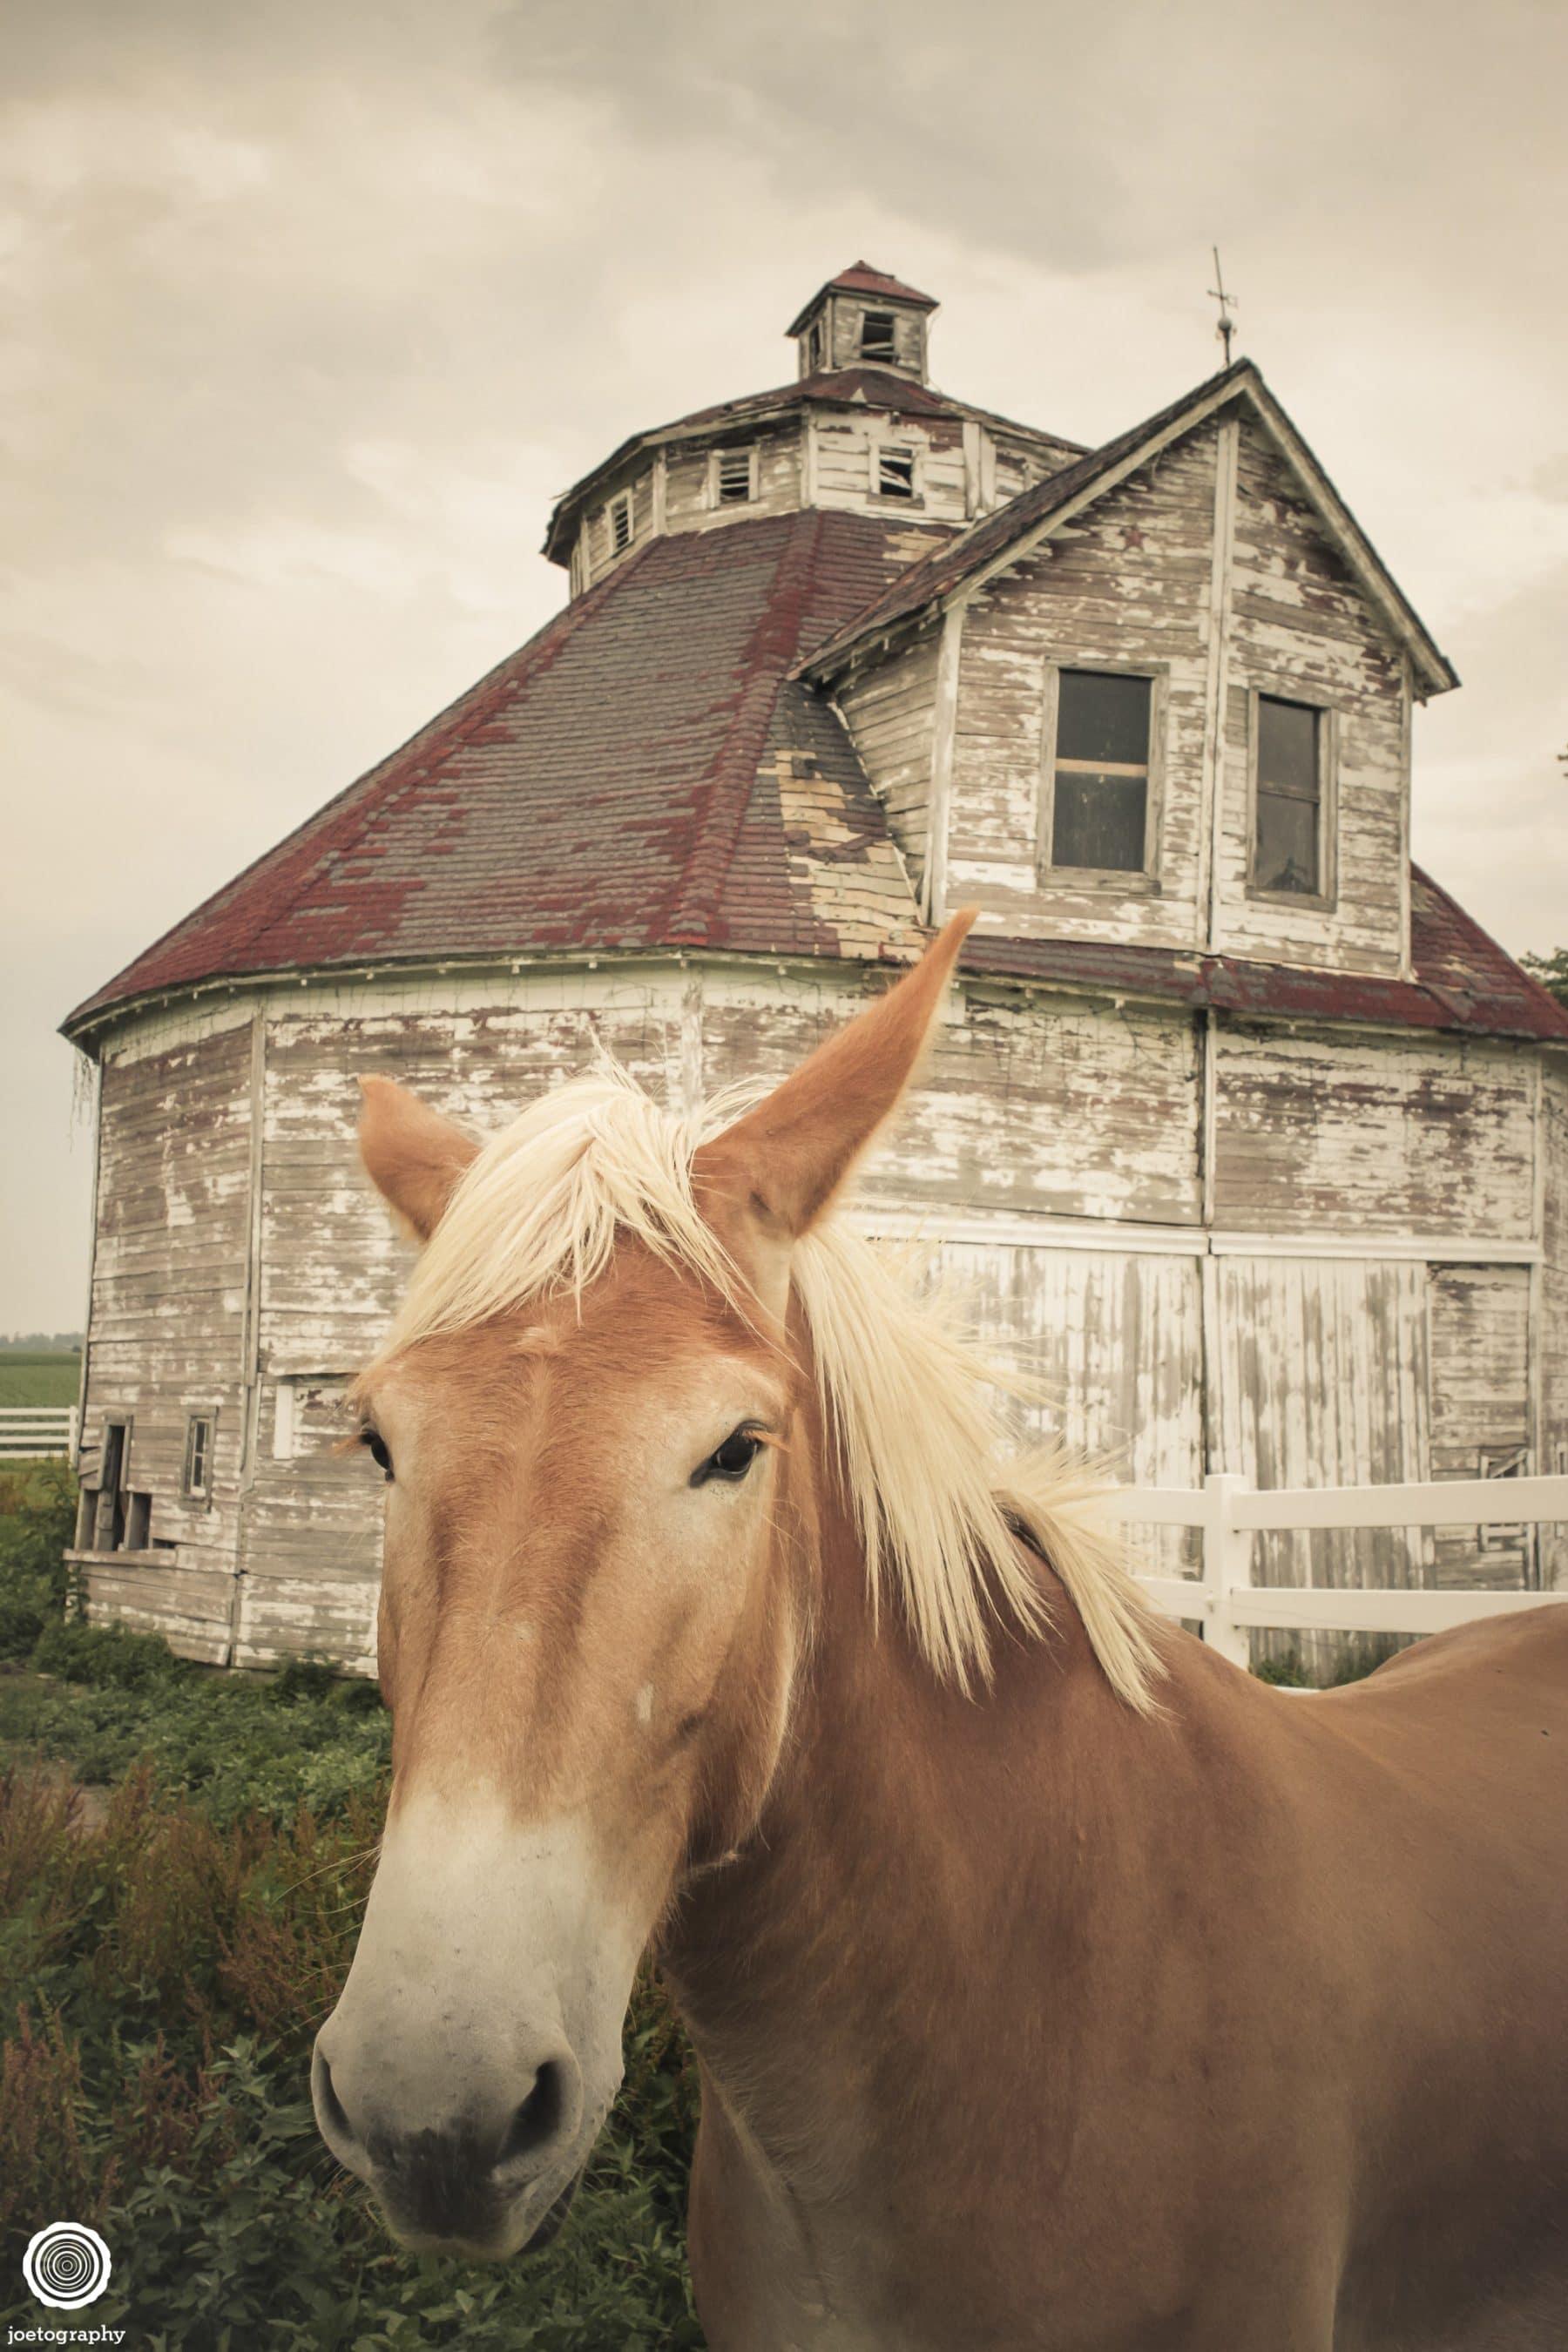 polygonal-barn-architecture-photos-shelbyville-indiana-4